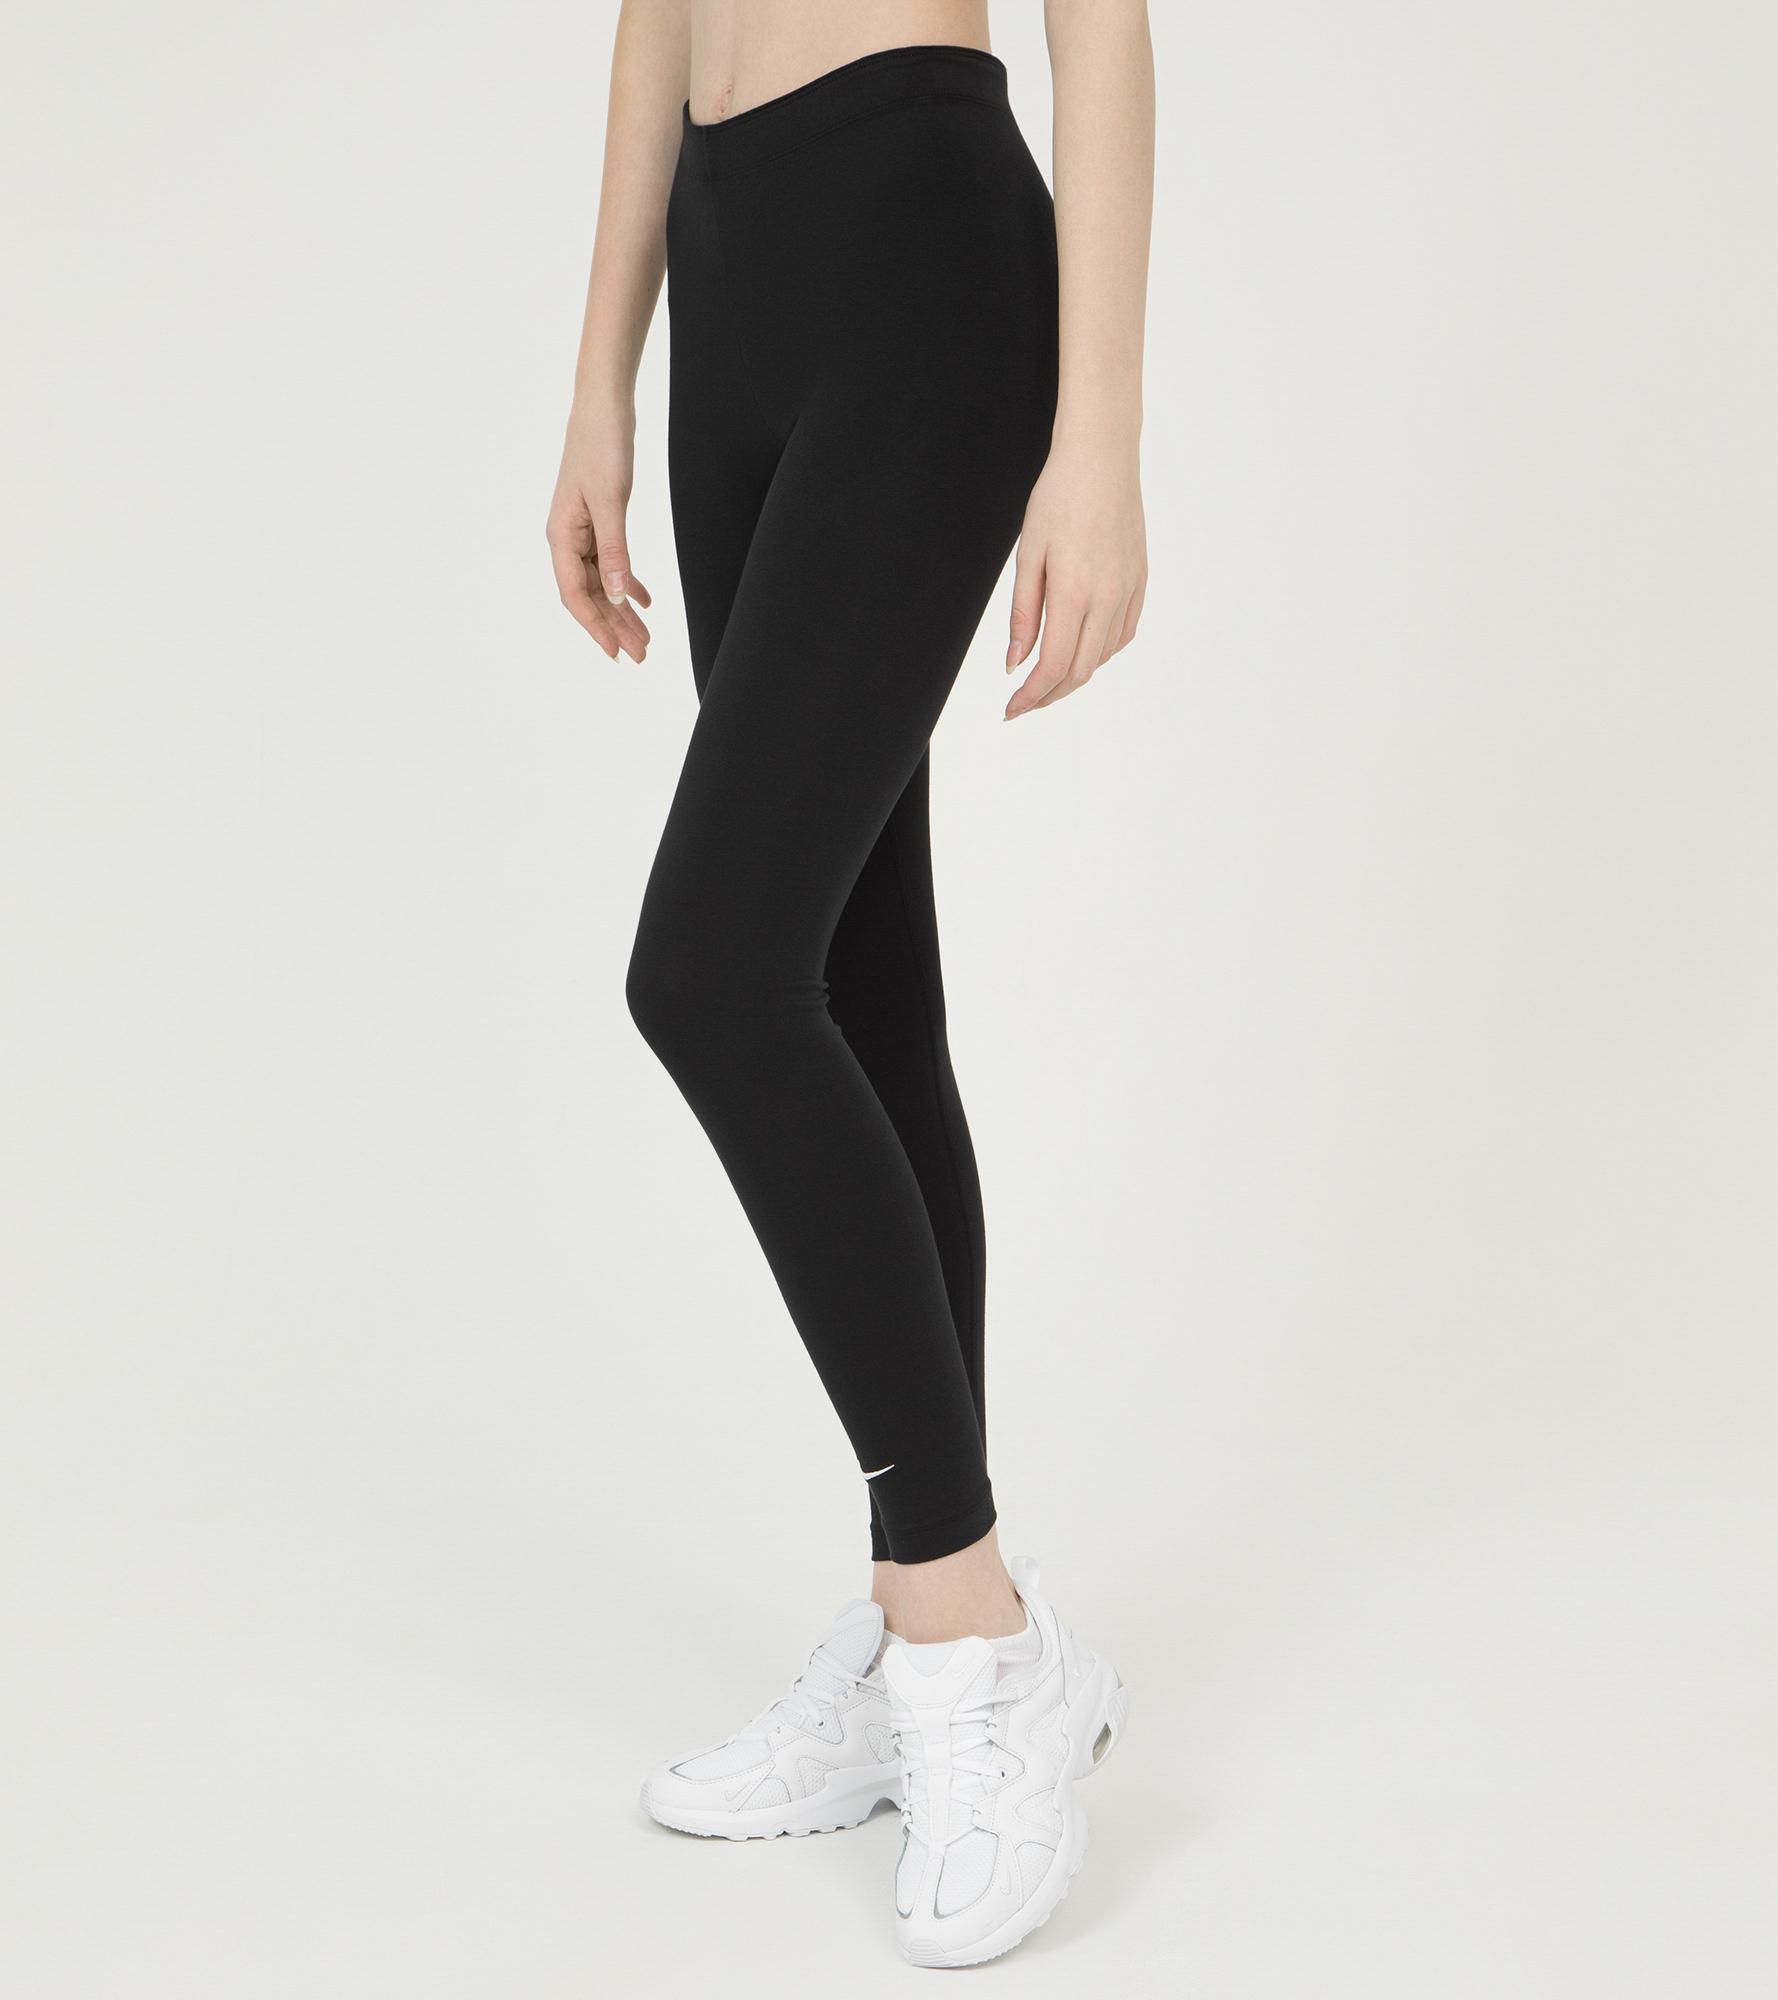 Nike Легинсы женские Sportswear Club, размер 40-42